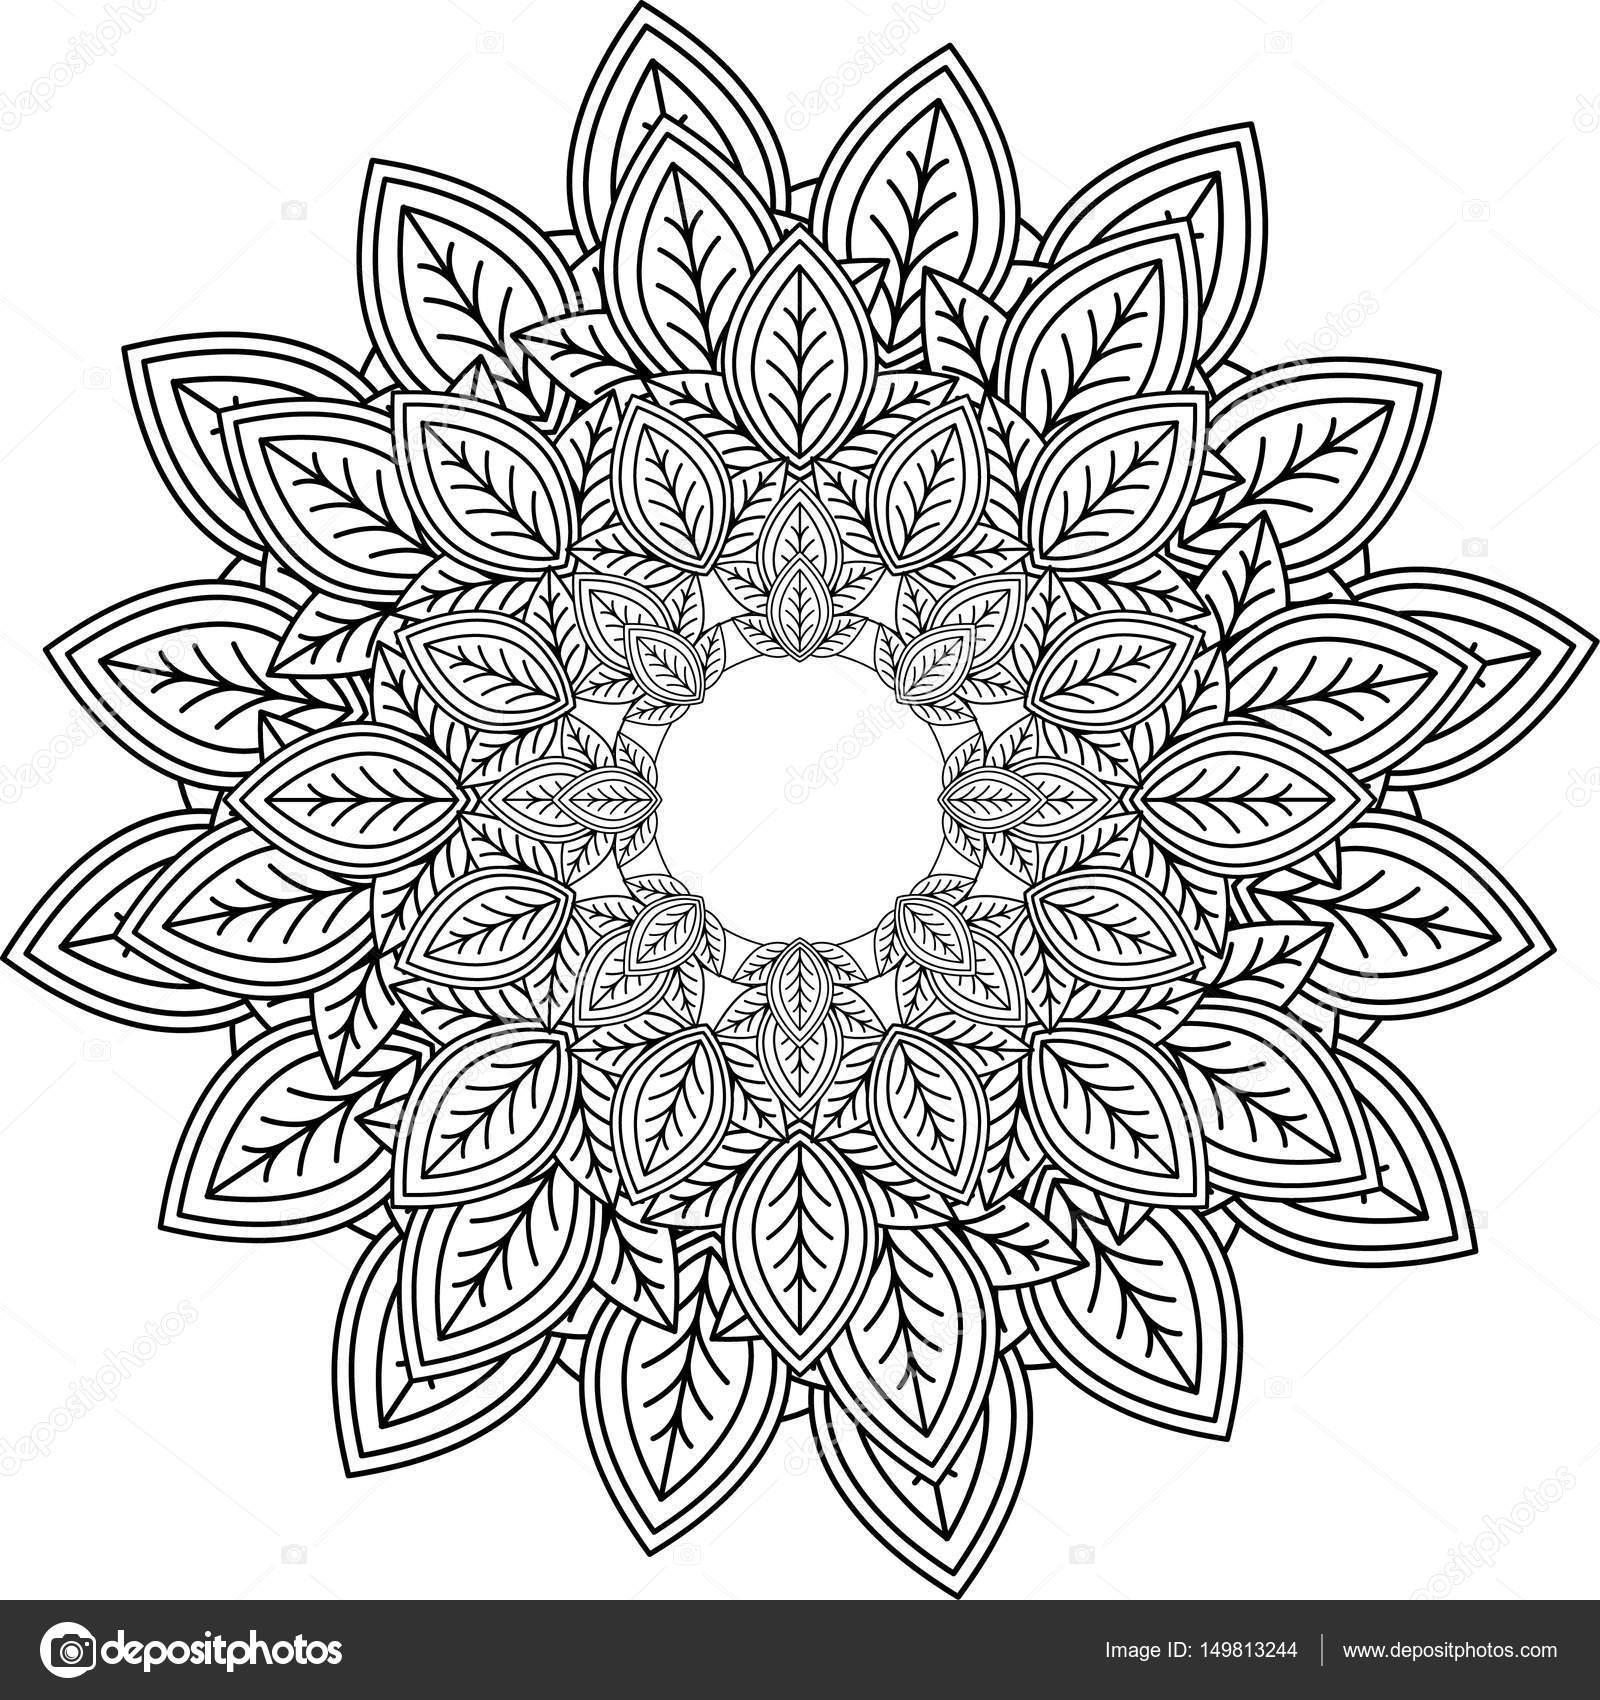 Drawn wallpaper black book Outsiderzone Photo © Stock wallpaper